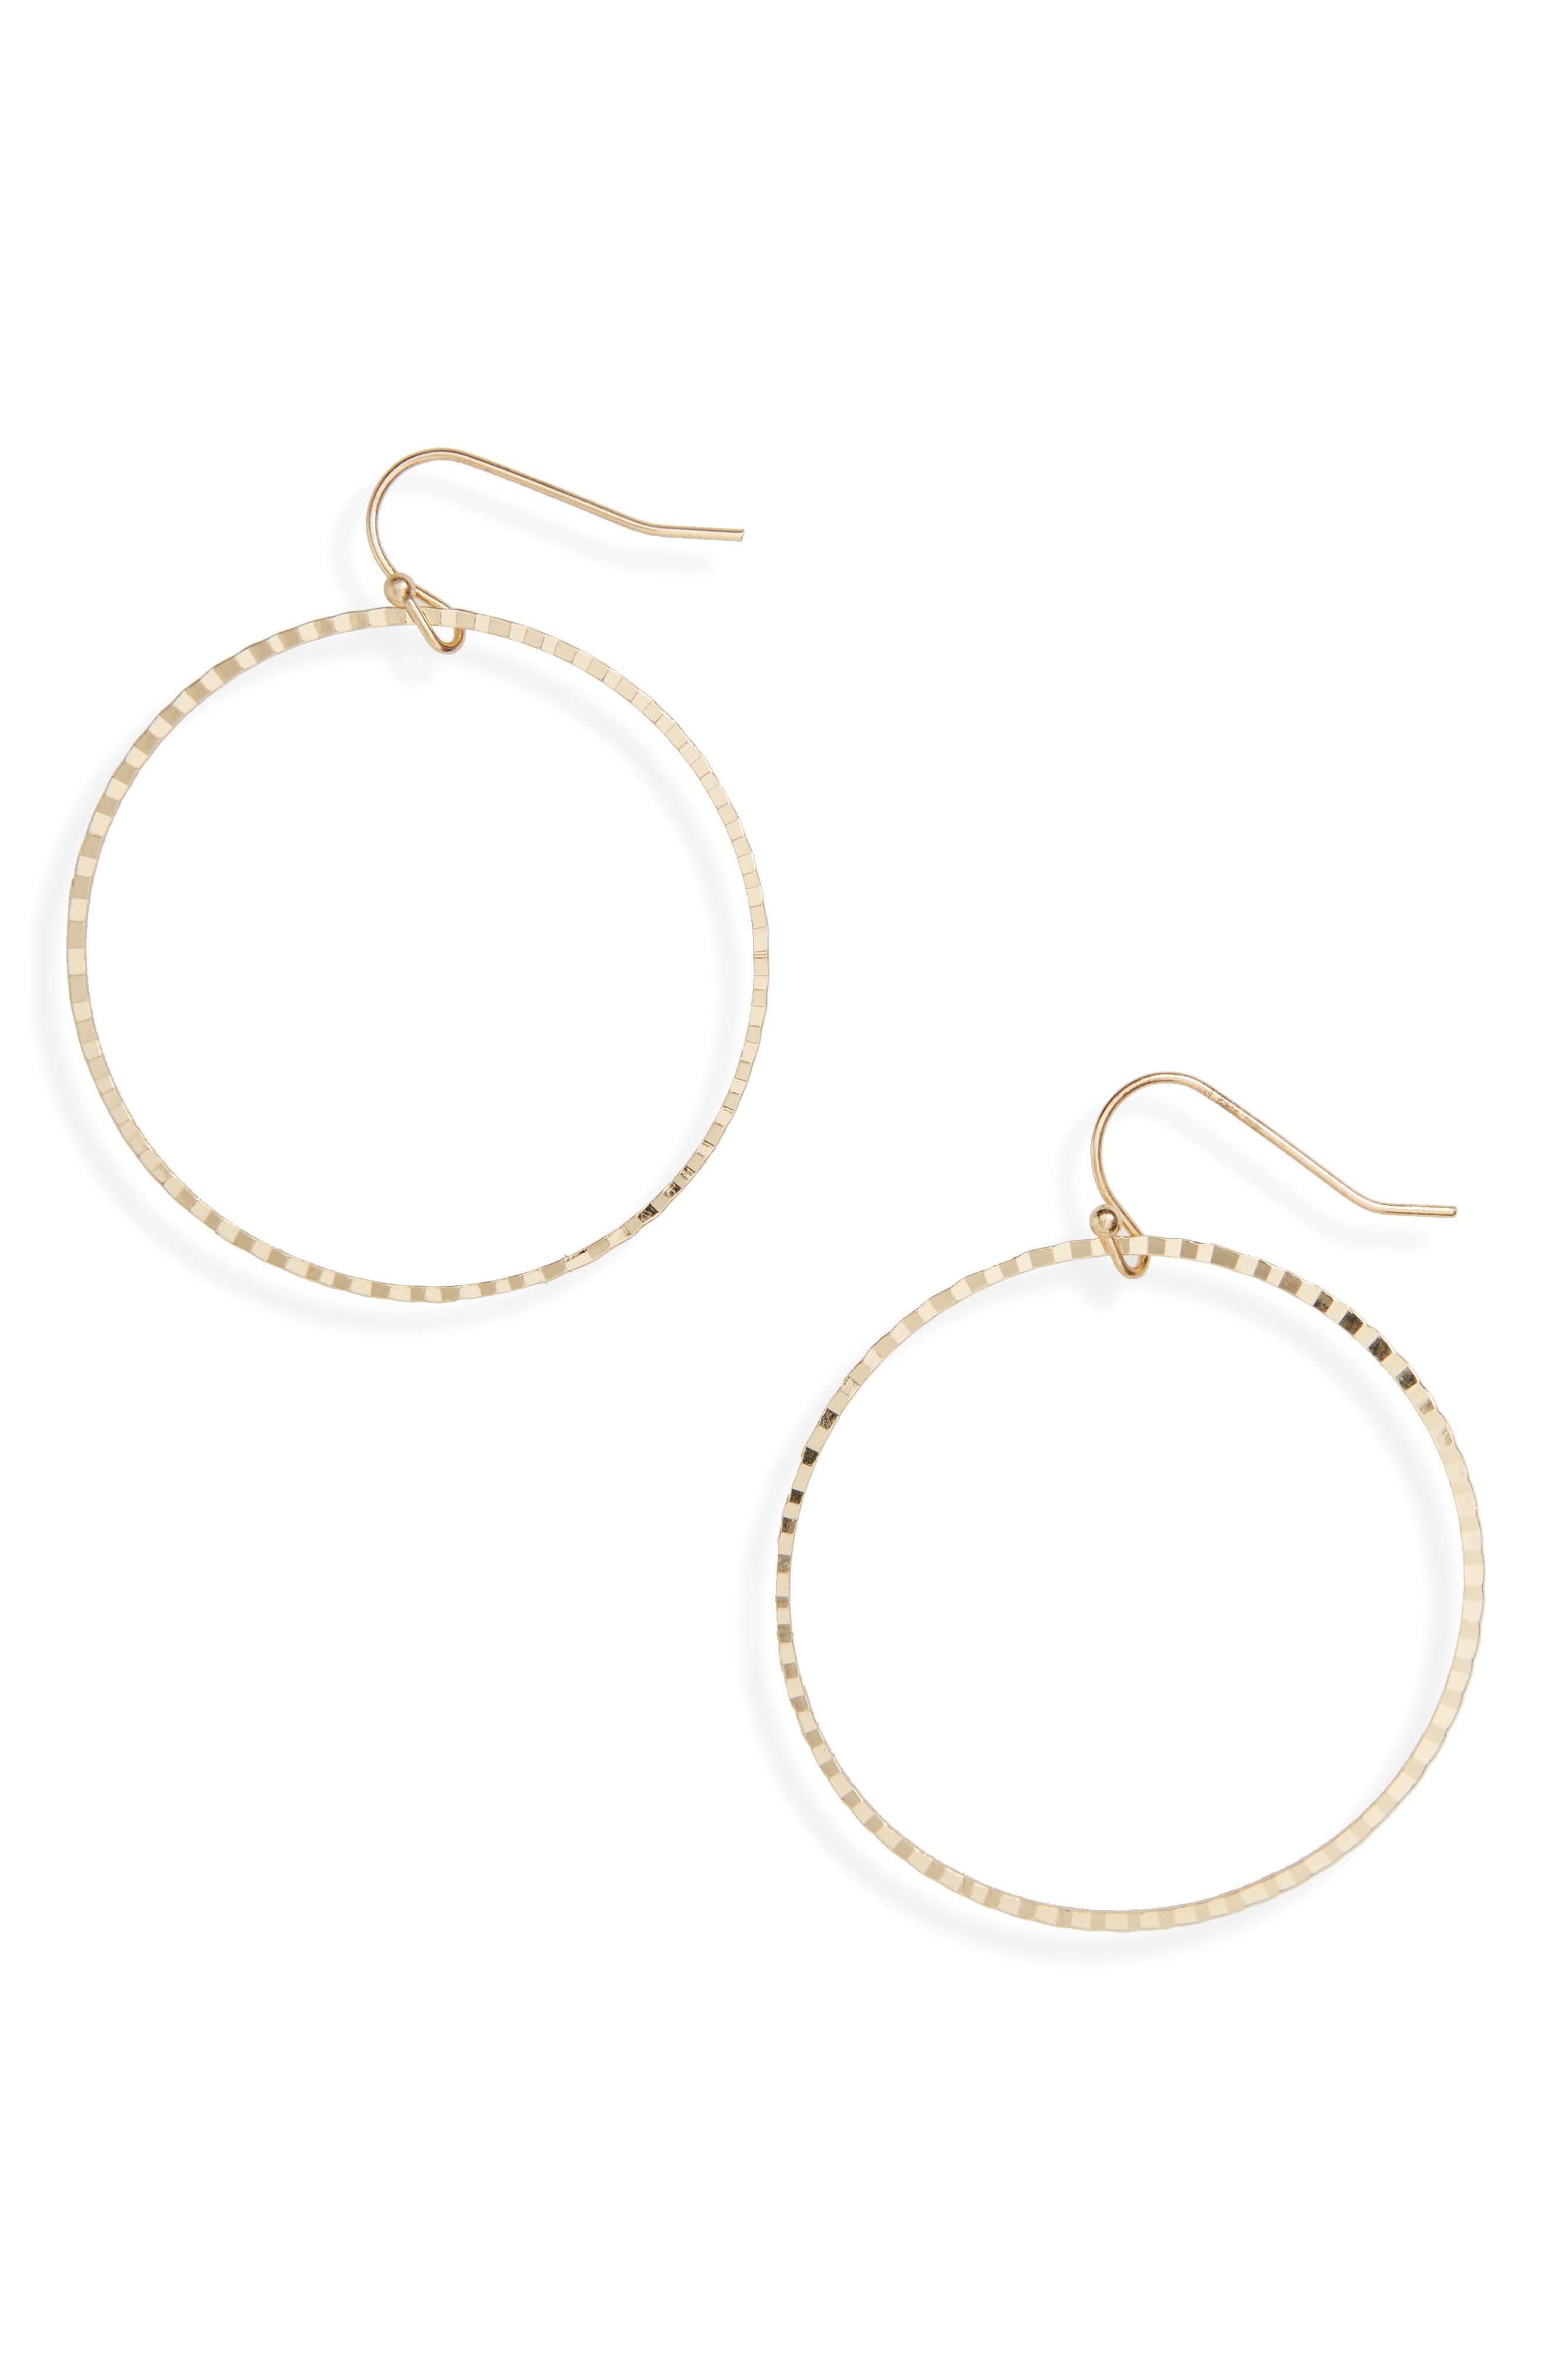 Textured Hoop Earrings,                             Main thumbnail 1, color,                             710